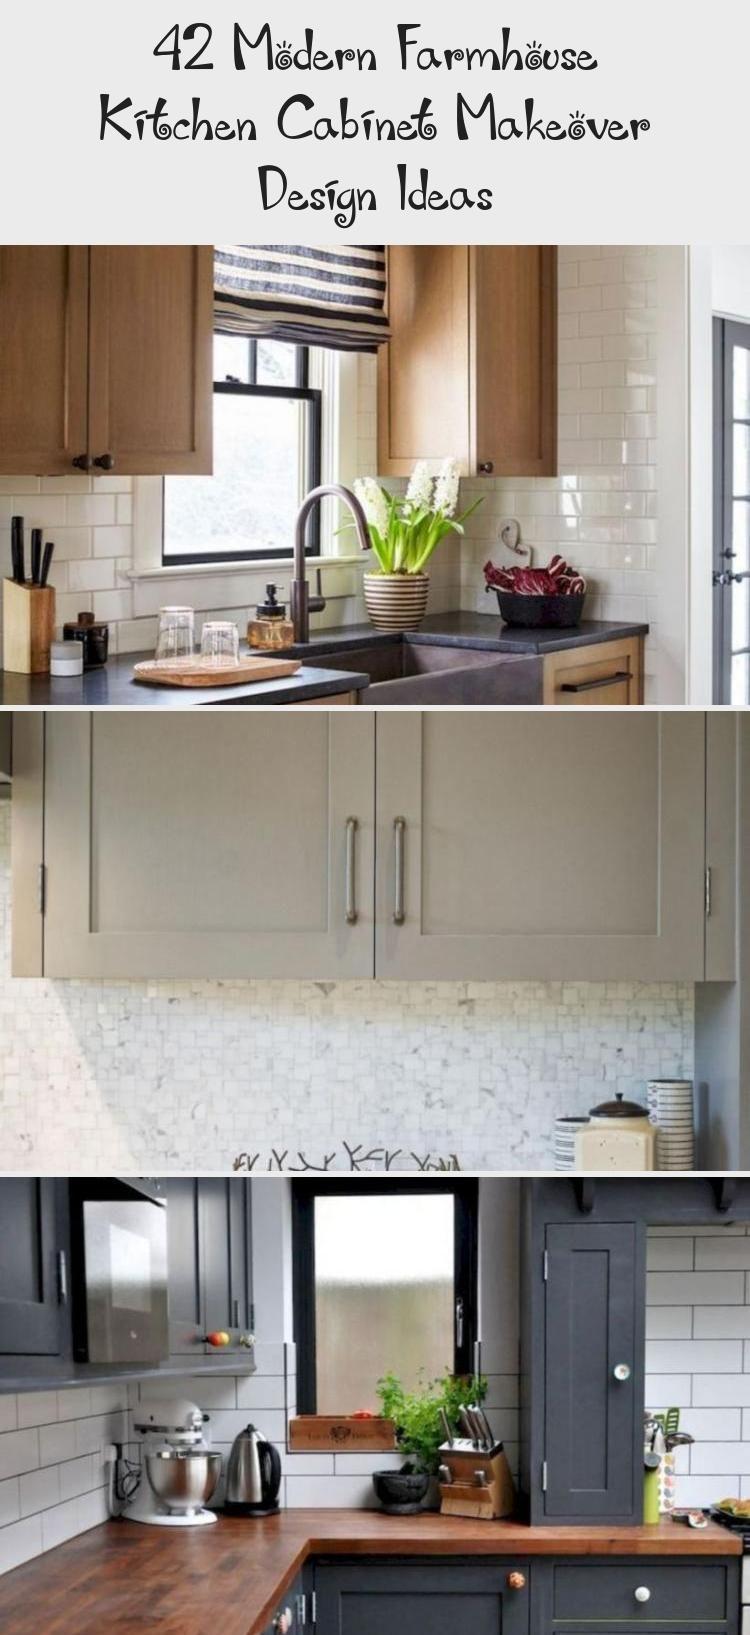 42 Modern Farmhouse Kitchen Cabinet Makeover Design Ideas Pinokyo In 2020 Farmhouse Kitchen Cabinets House Bathroom Kitchen Cabinets Makeover